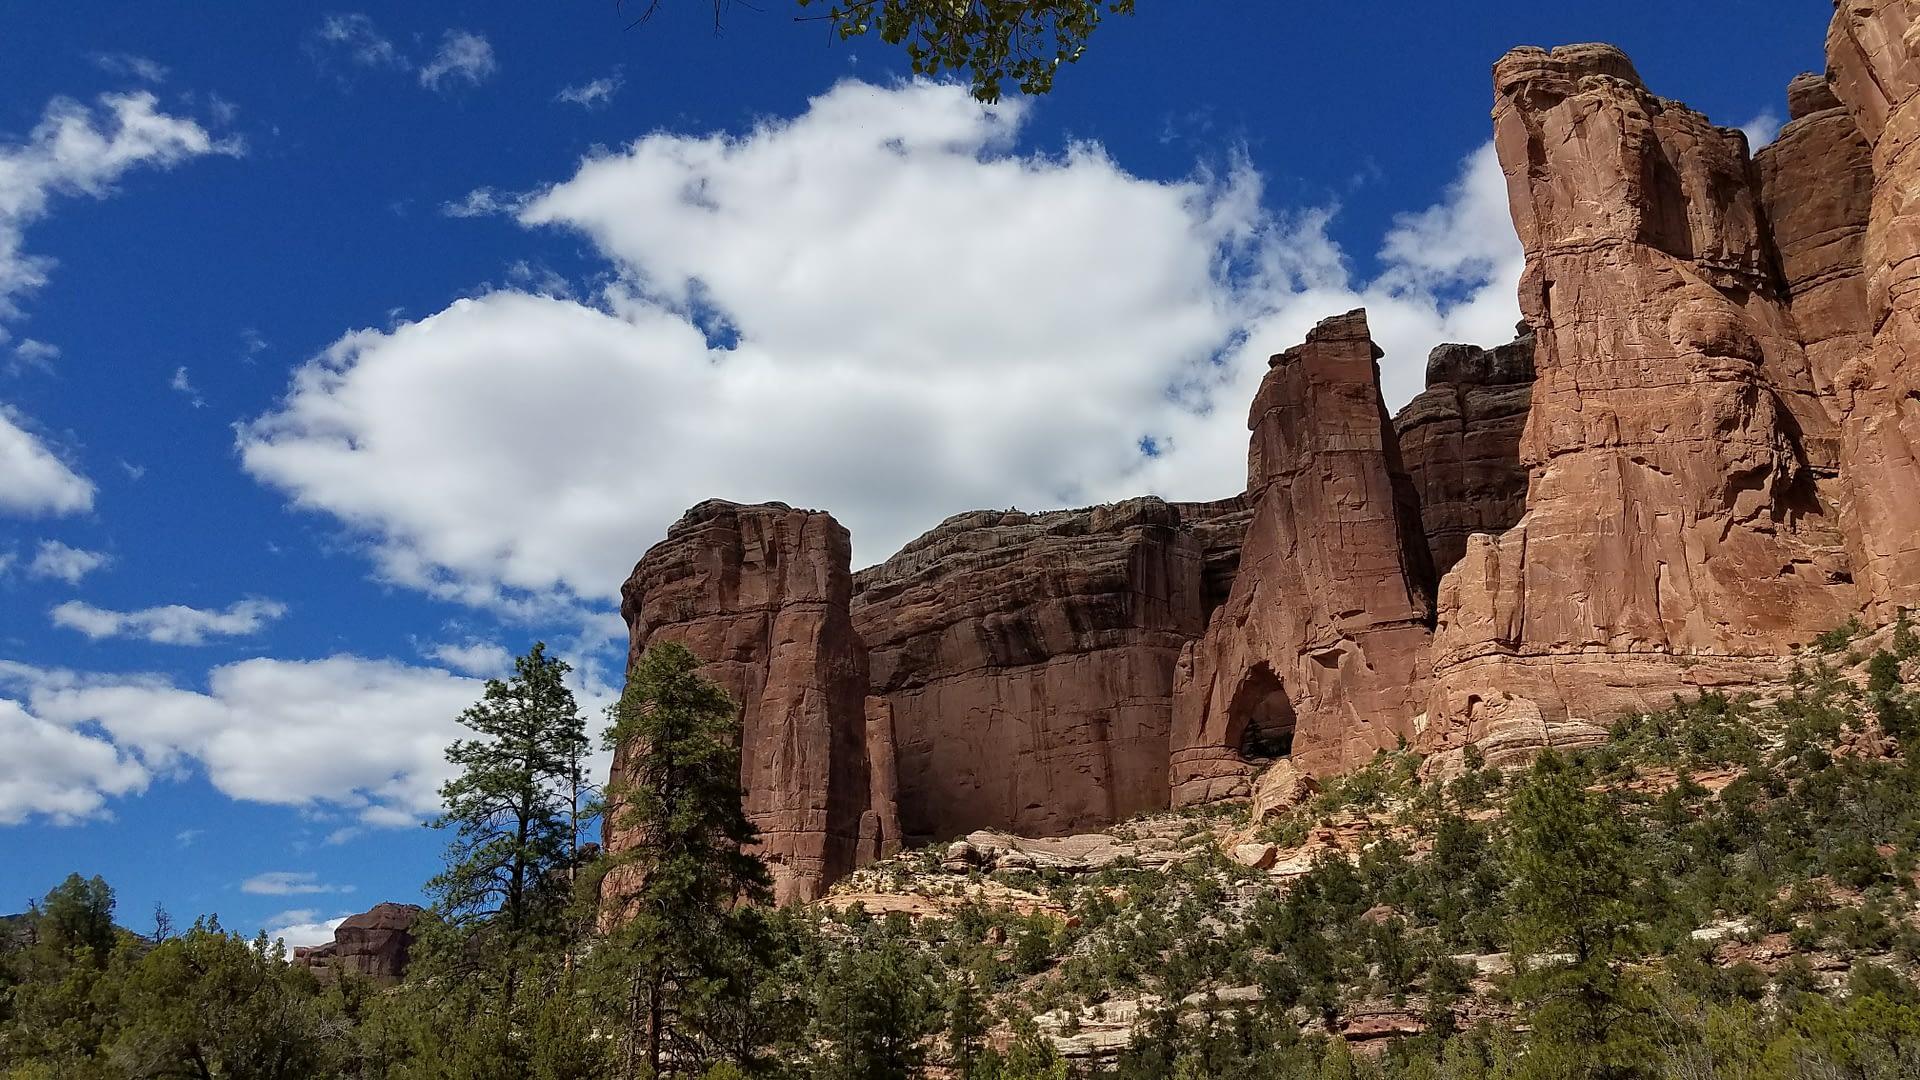 Arch Canyon UTV Excursion